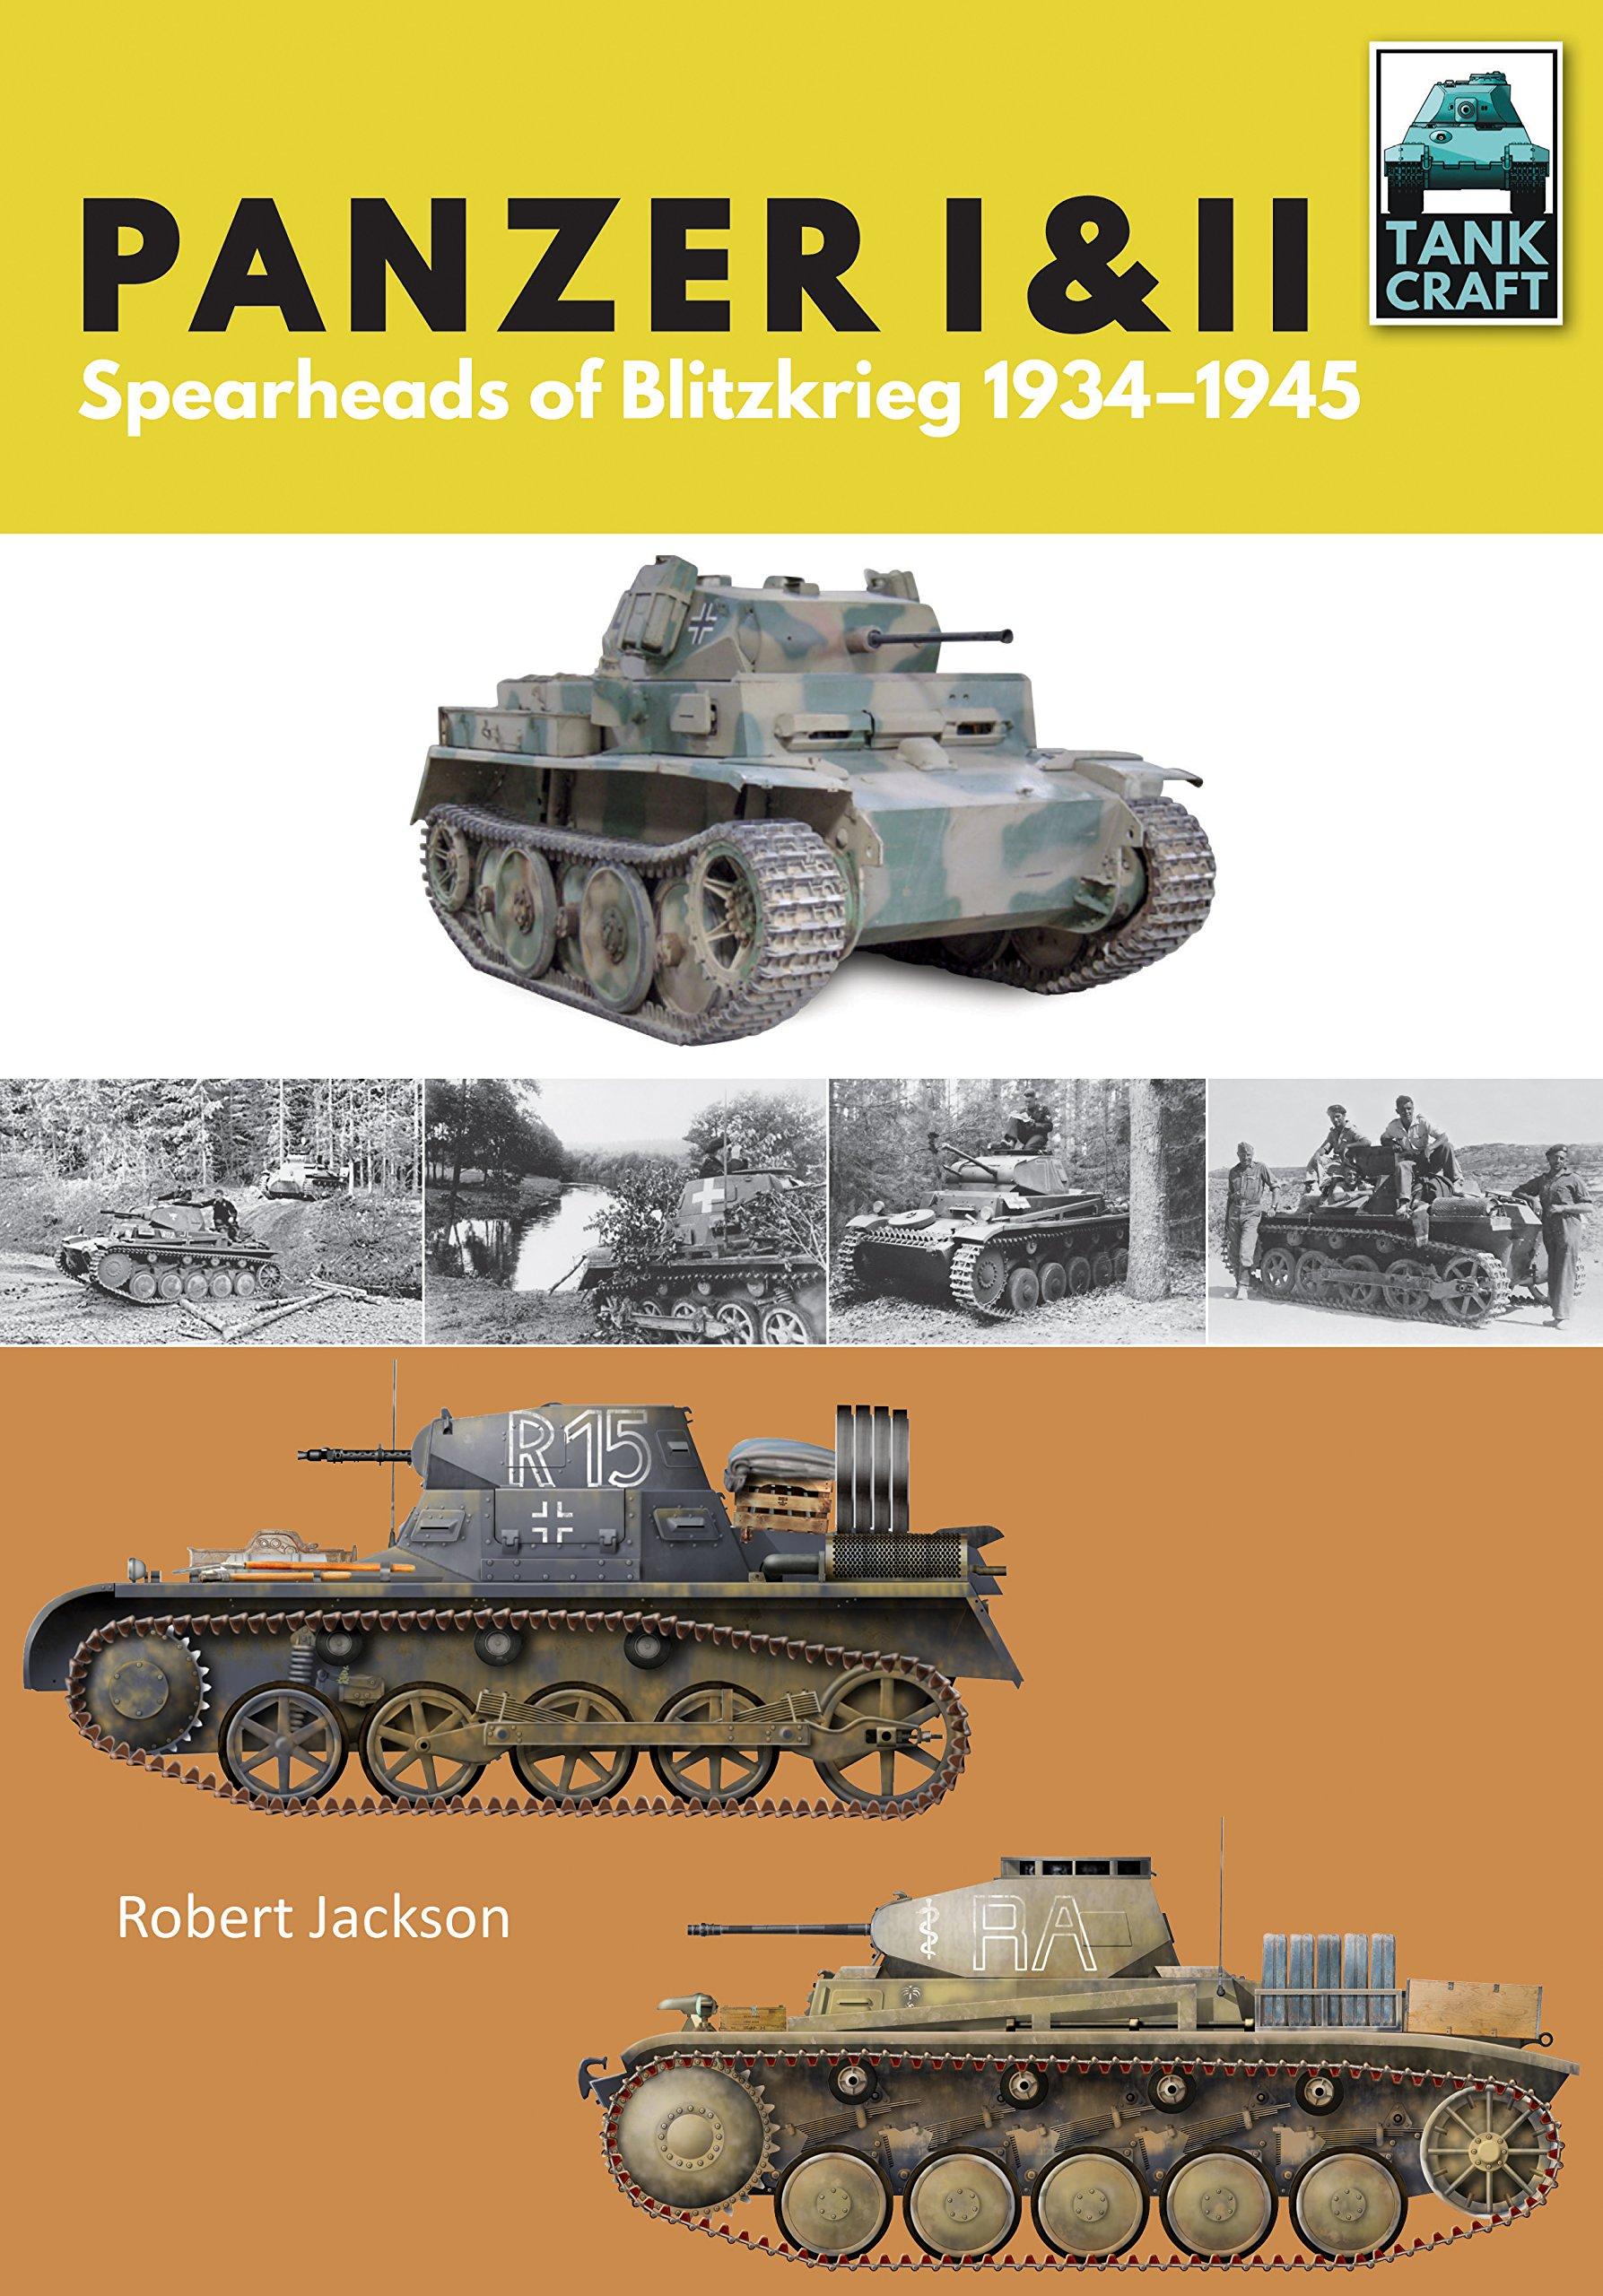 Panzer I And II  Blueprint For Blitzkrieg 1933 1941  Tank Craft Band 7